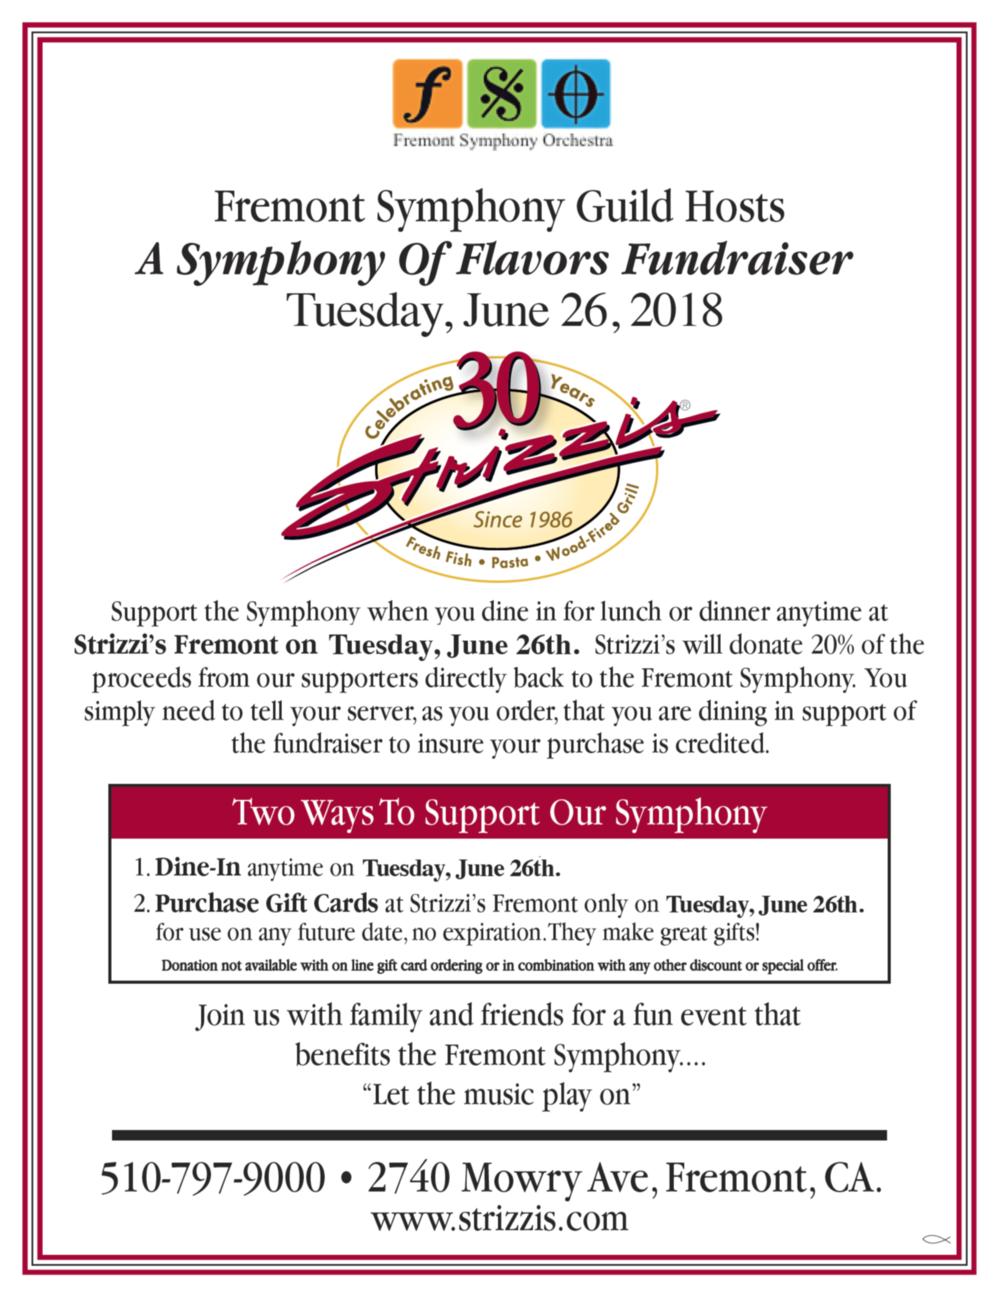 FSO Fundraiser @ Strizzi's in Fremont